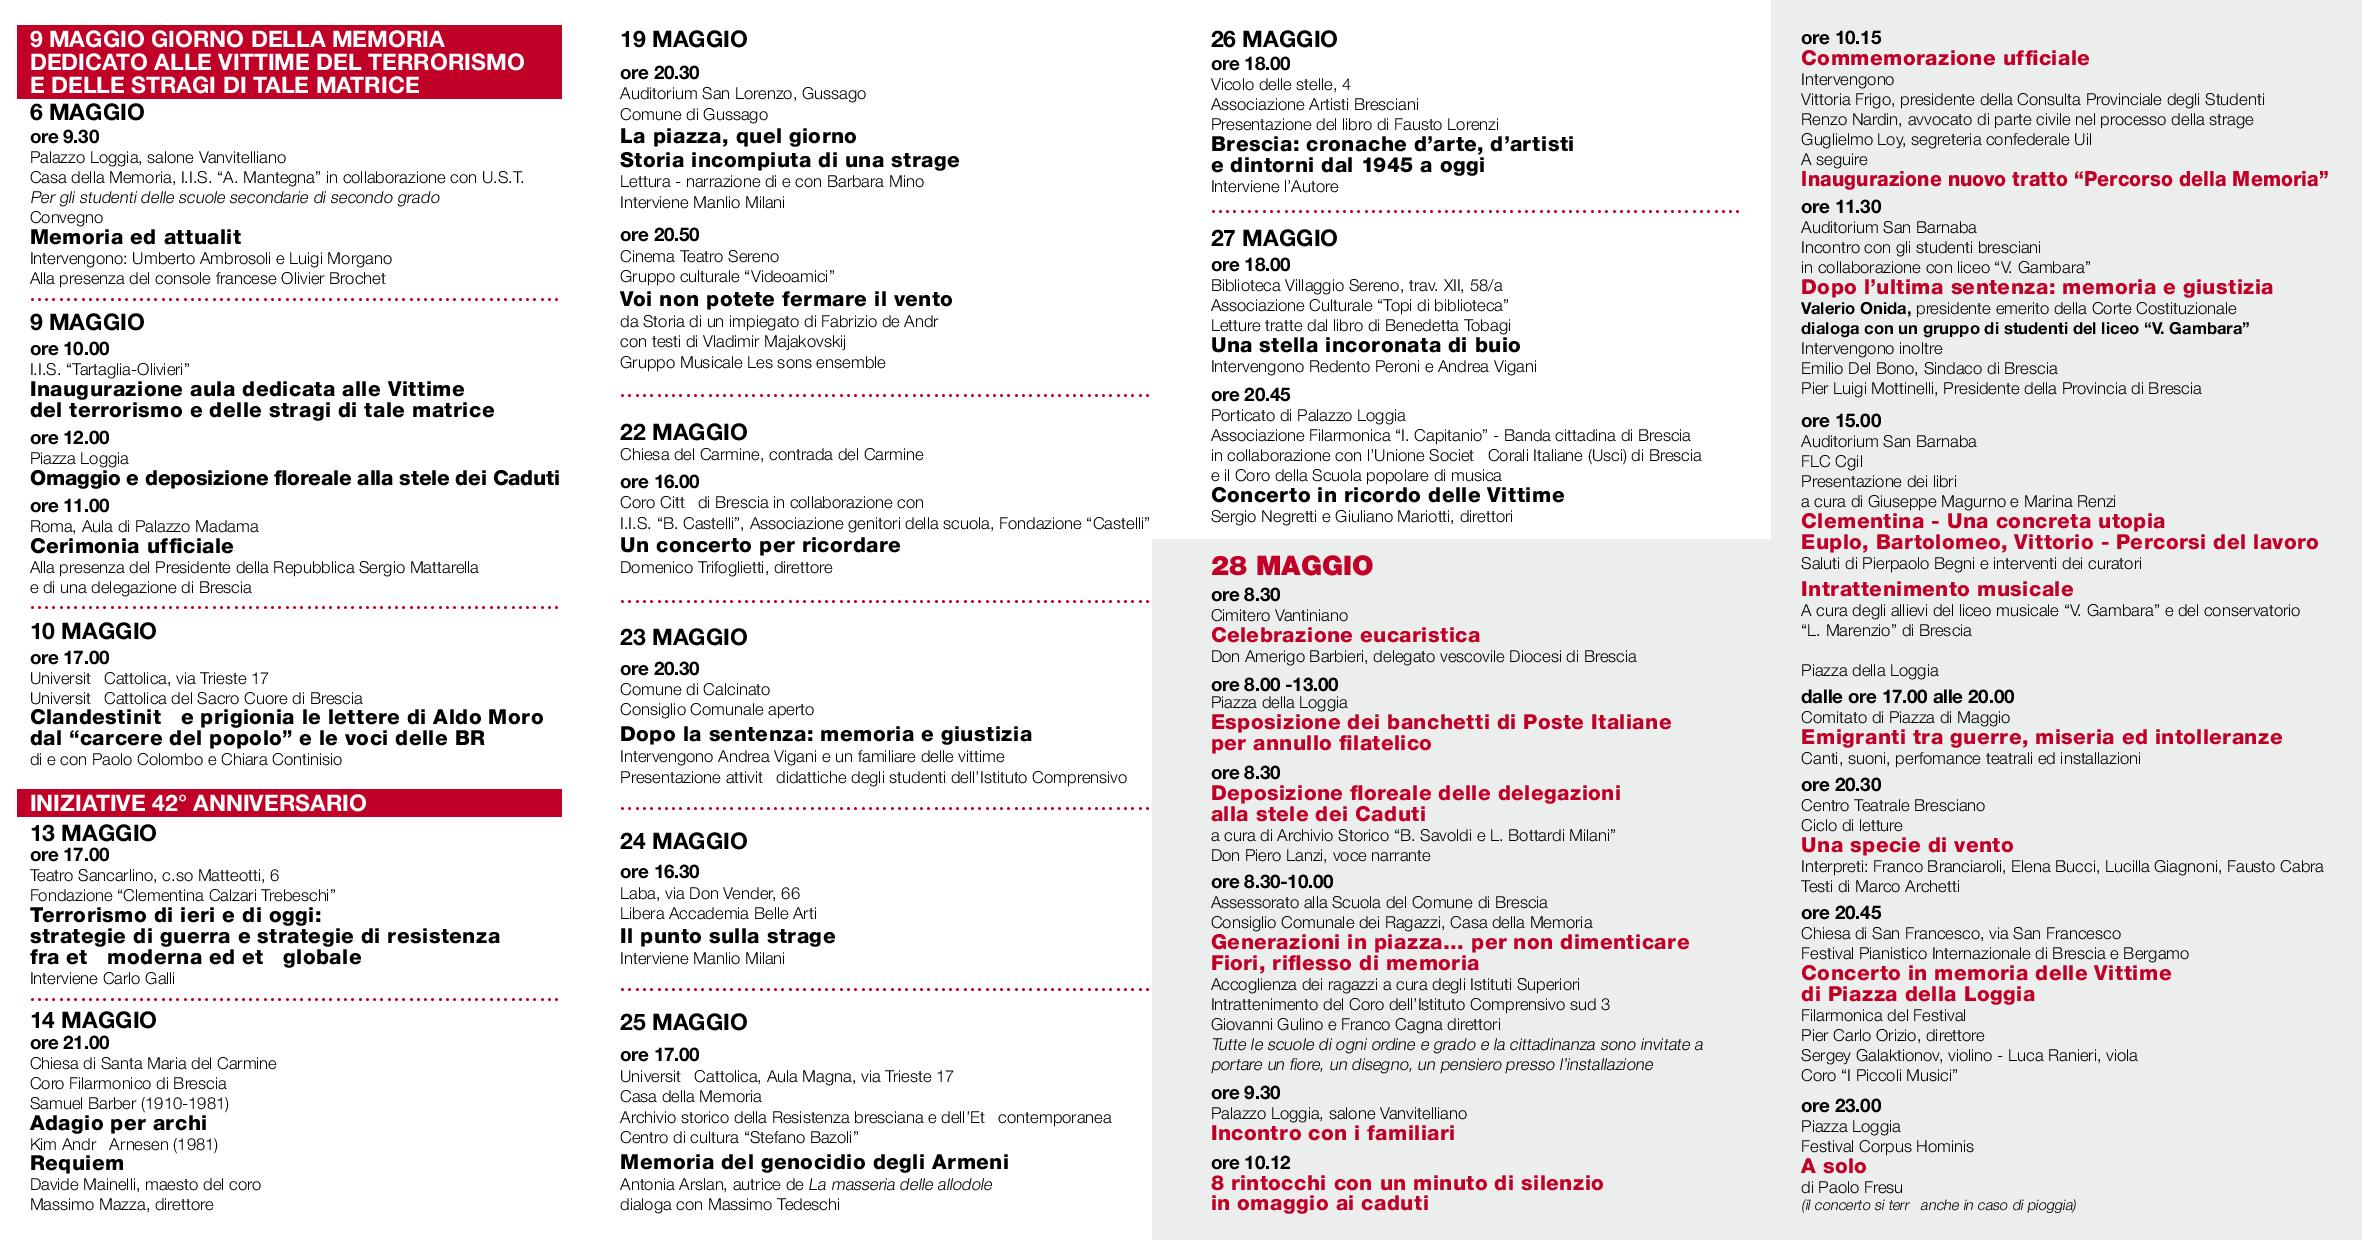 28 MAGGIO web-page-002